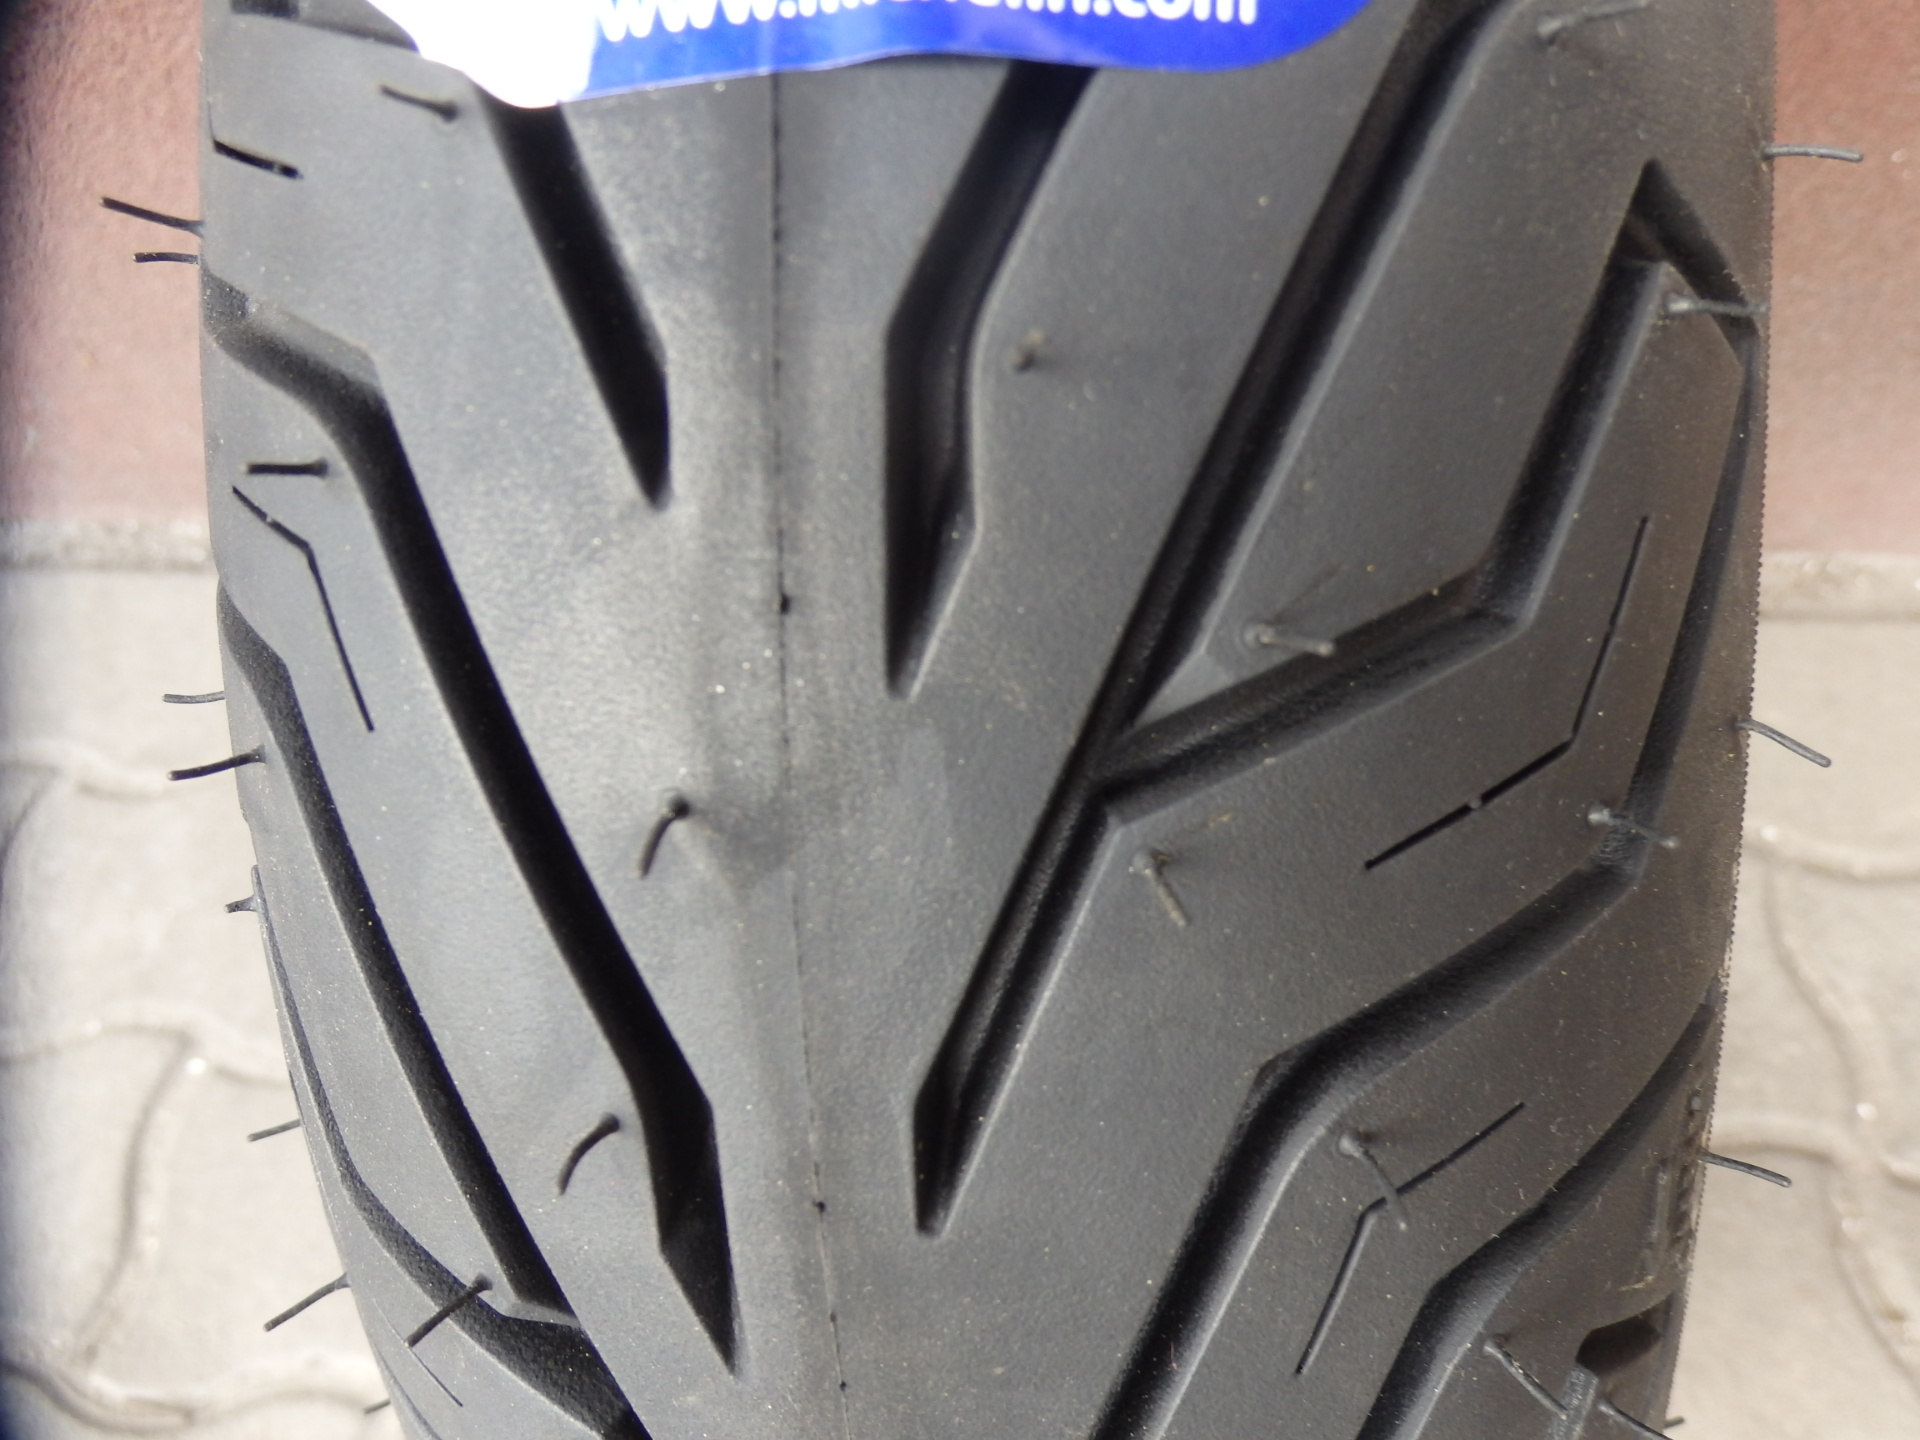 SUZUKI BURGMAN Gumi kŐpeny hátsó 130/70-13 Burgman 250-400 Michelin - 18600 Ft